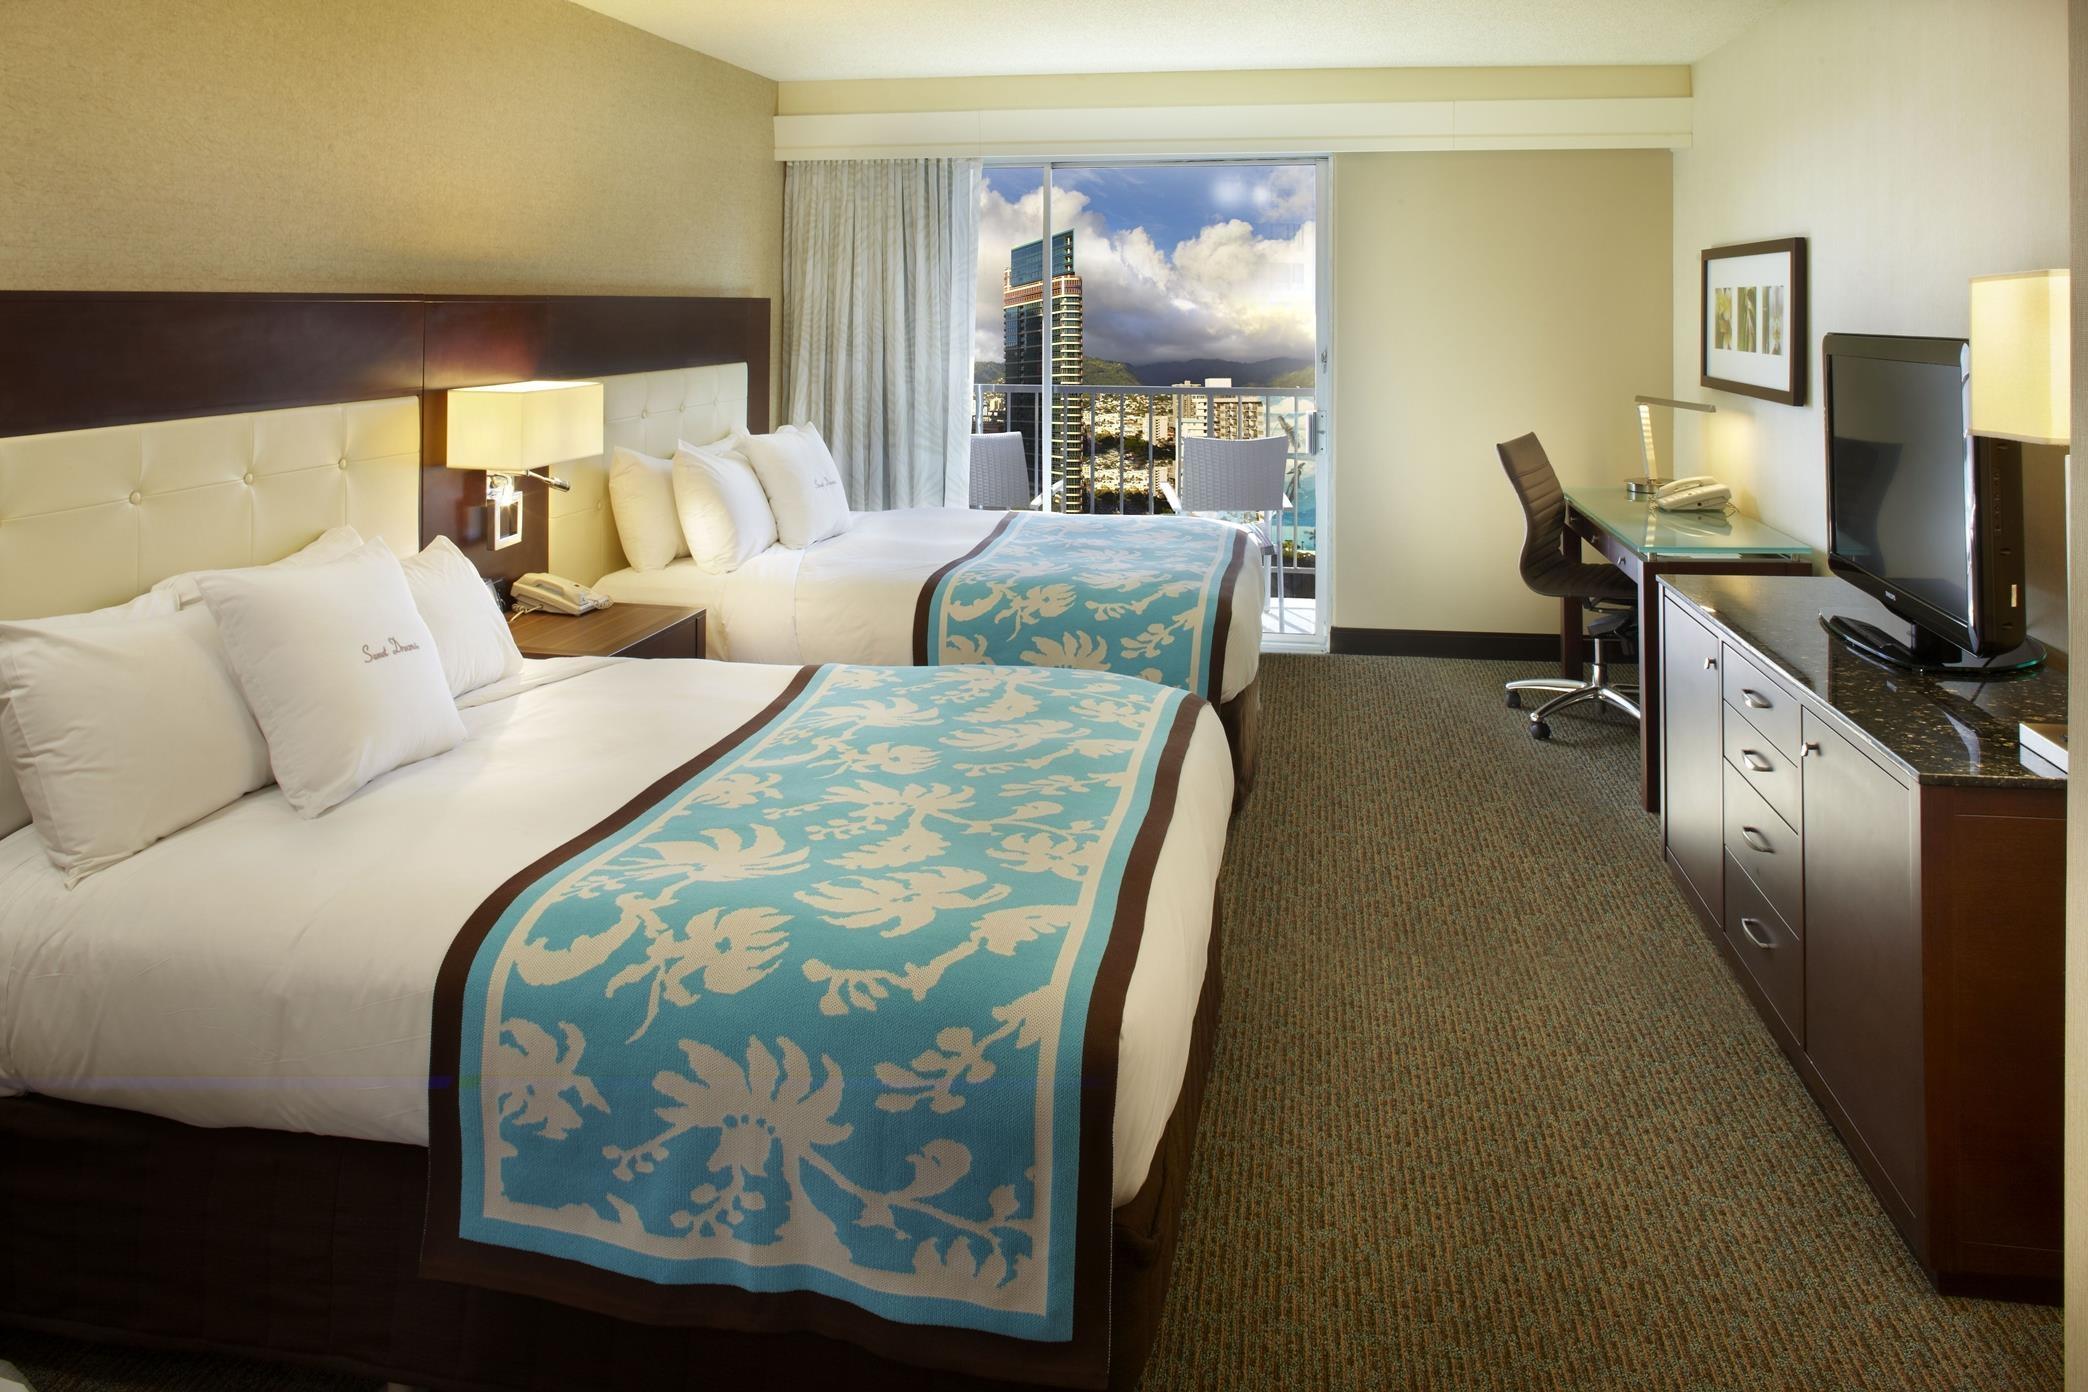 DoubleTree by Hilton Hotel Alana - Waikiki Beach image 15